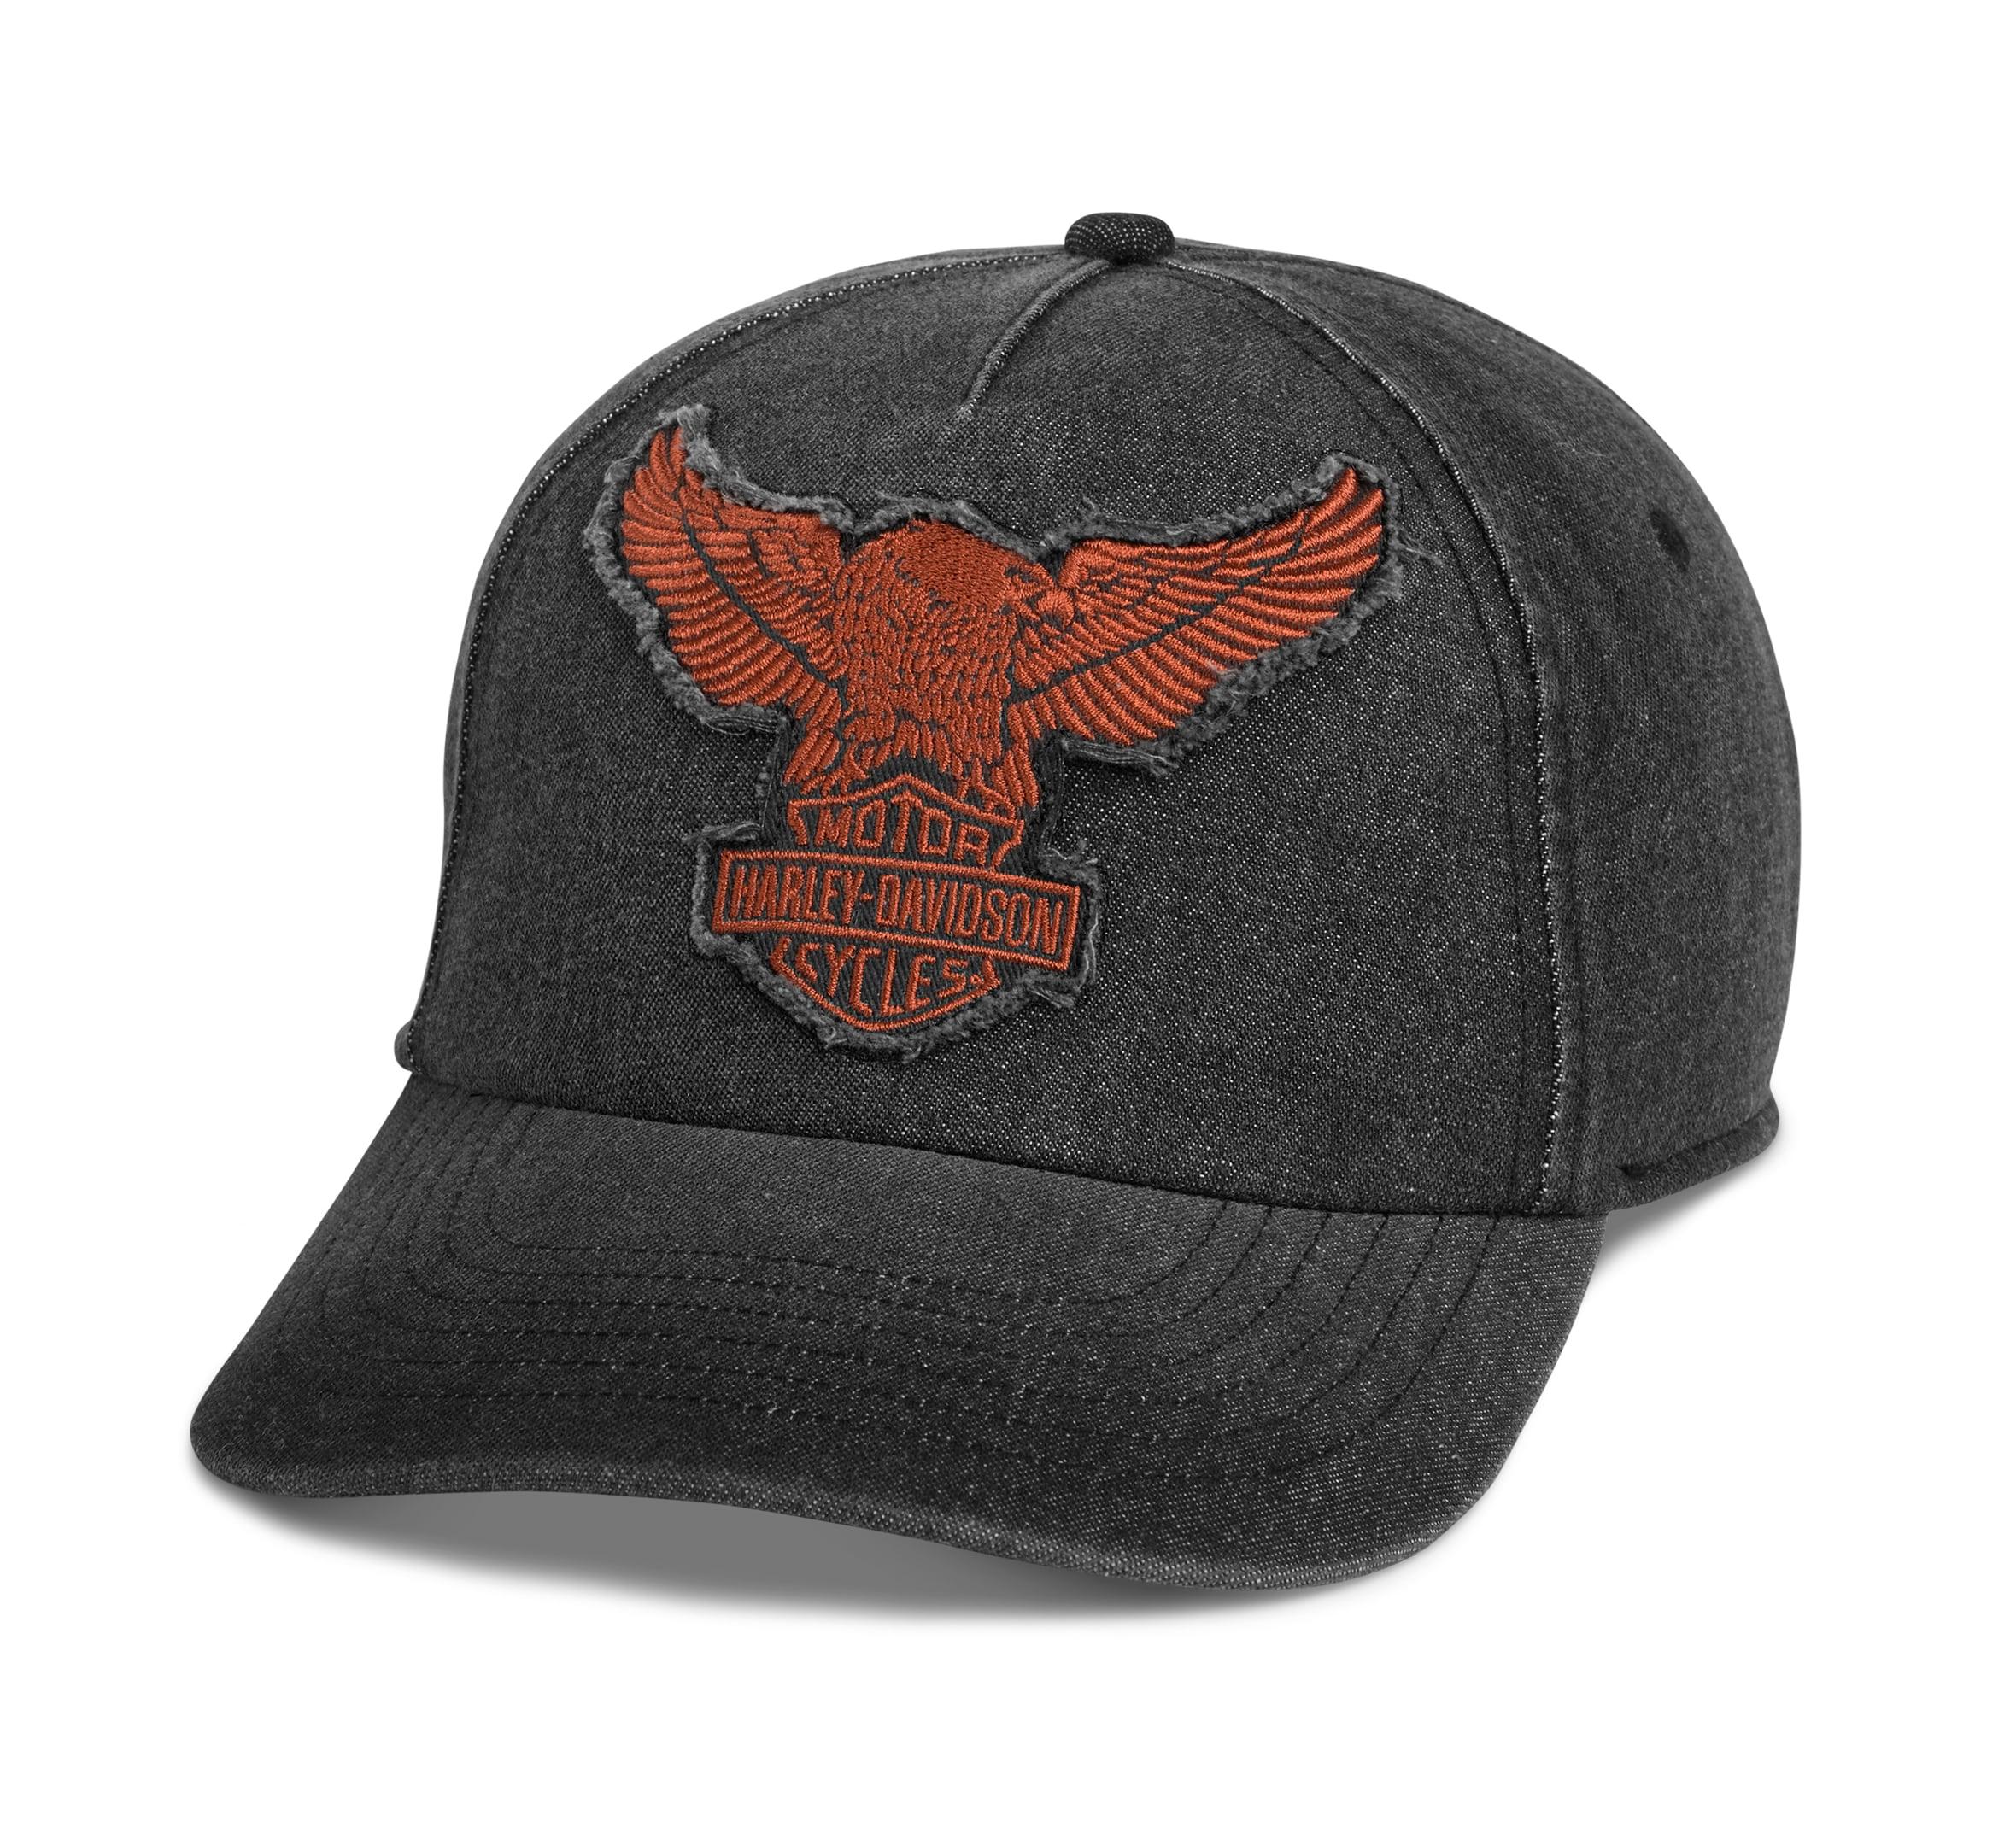 H97689-21VM Gorra hombre Winged Eagle Baseball